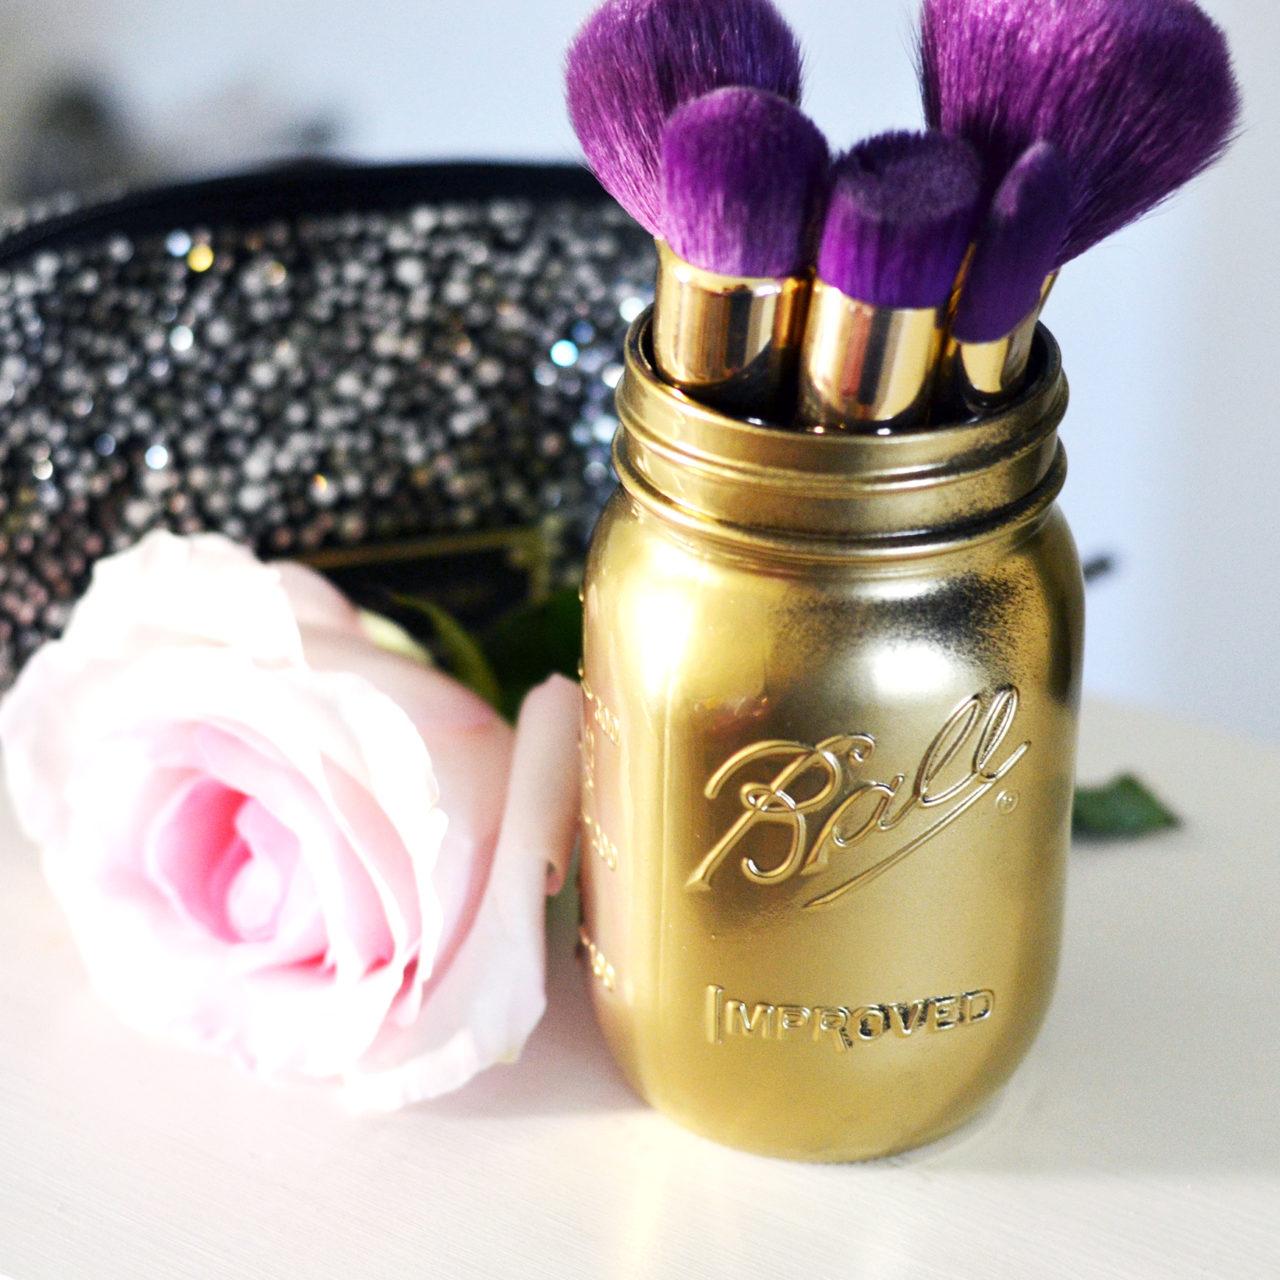 DIY Mason Jar Makeup Brush Holders with Orchard Supply Hardware